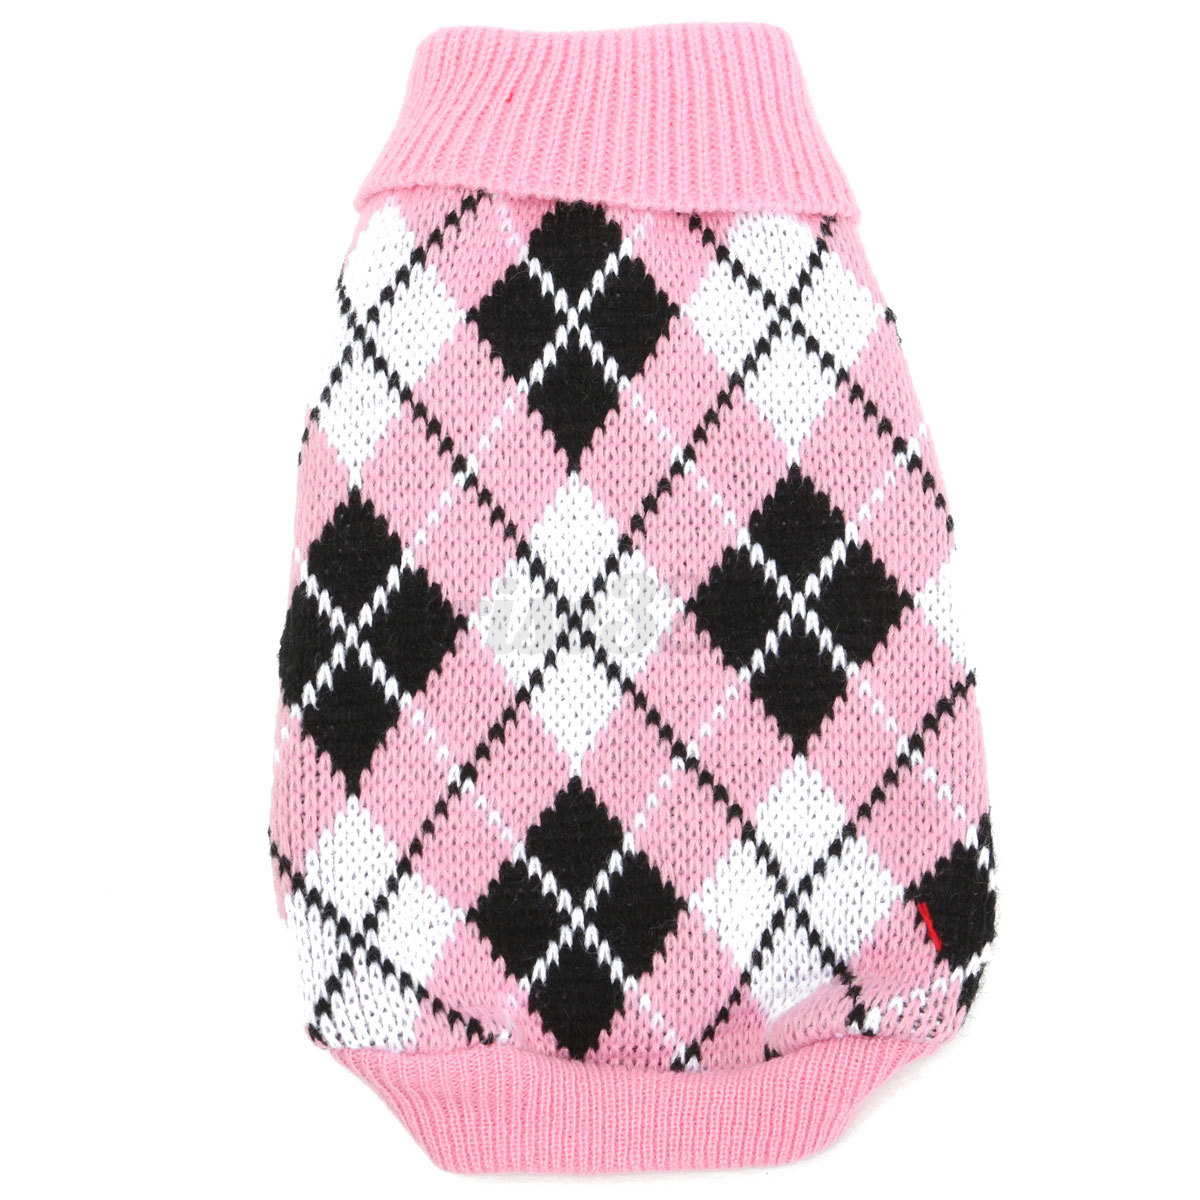 Cat Puppy Pet Dog Plaid Sweater Coat Costume Apparel Warm ...